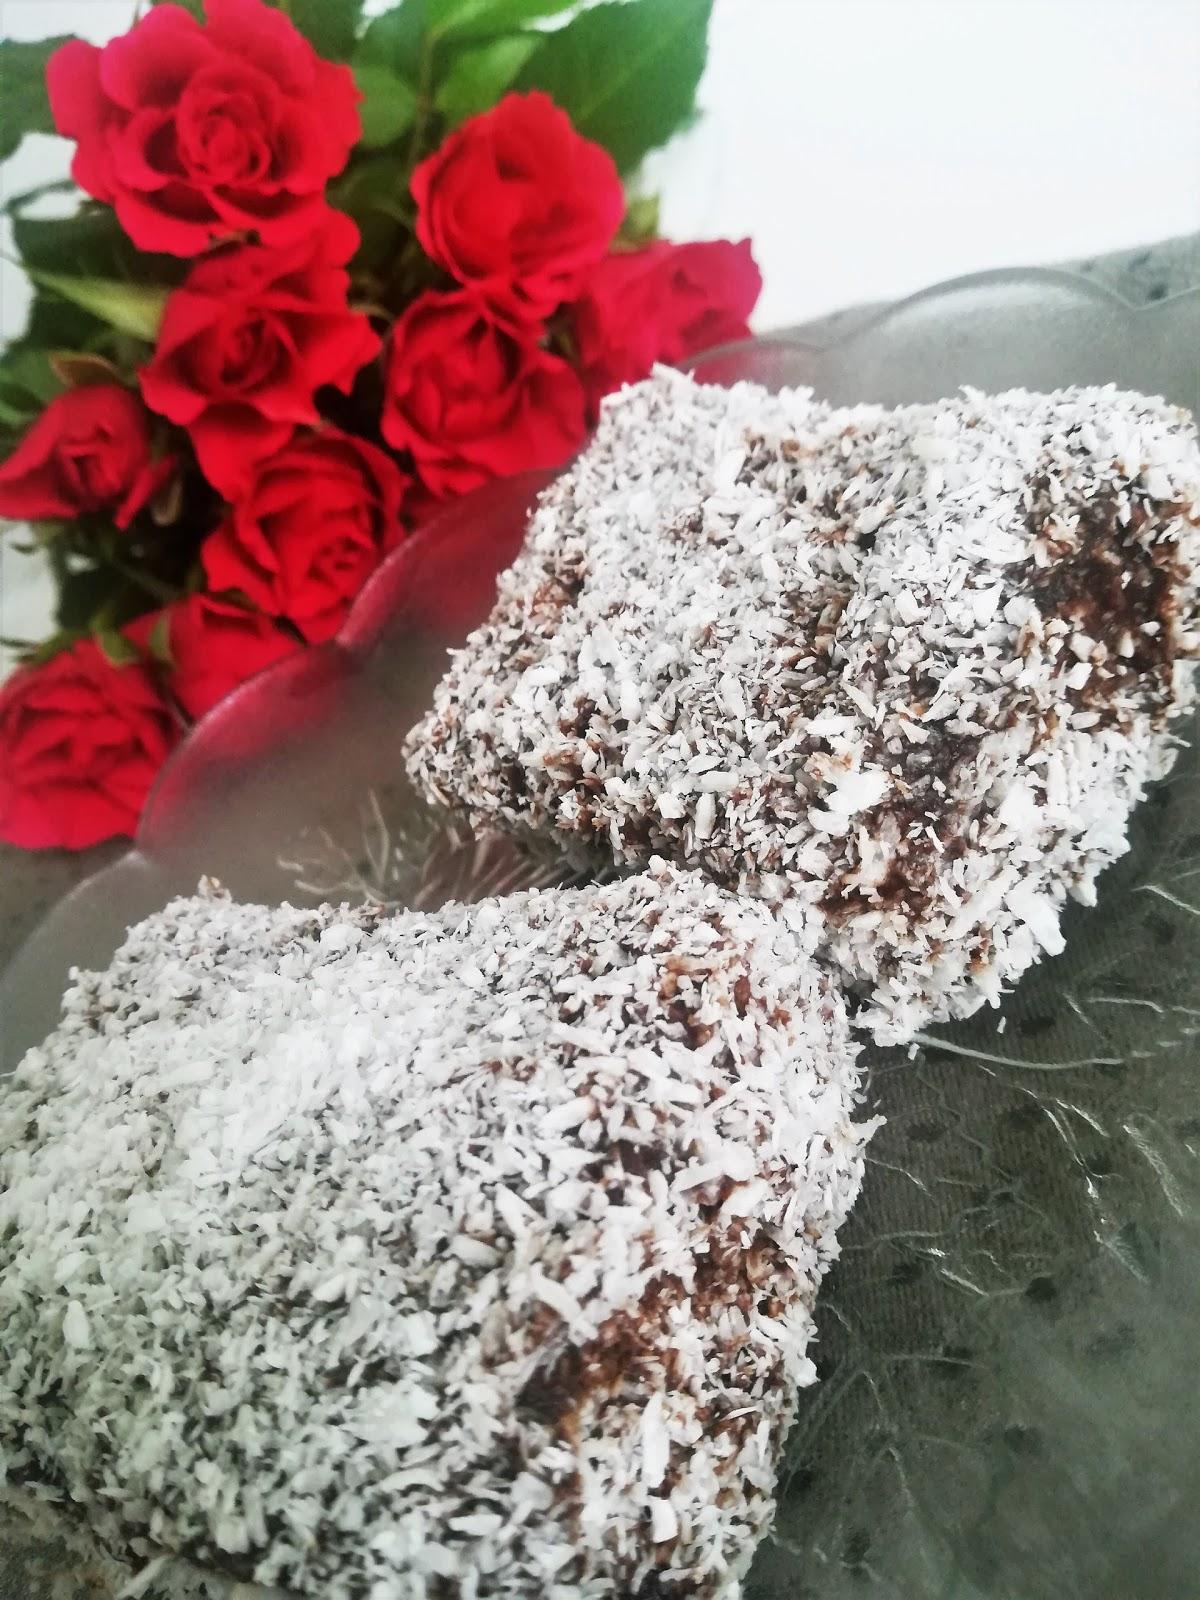 Kostka Kokosowa (kokosanki)